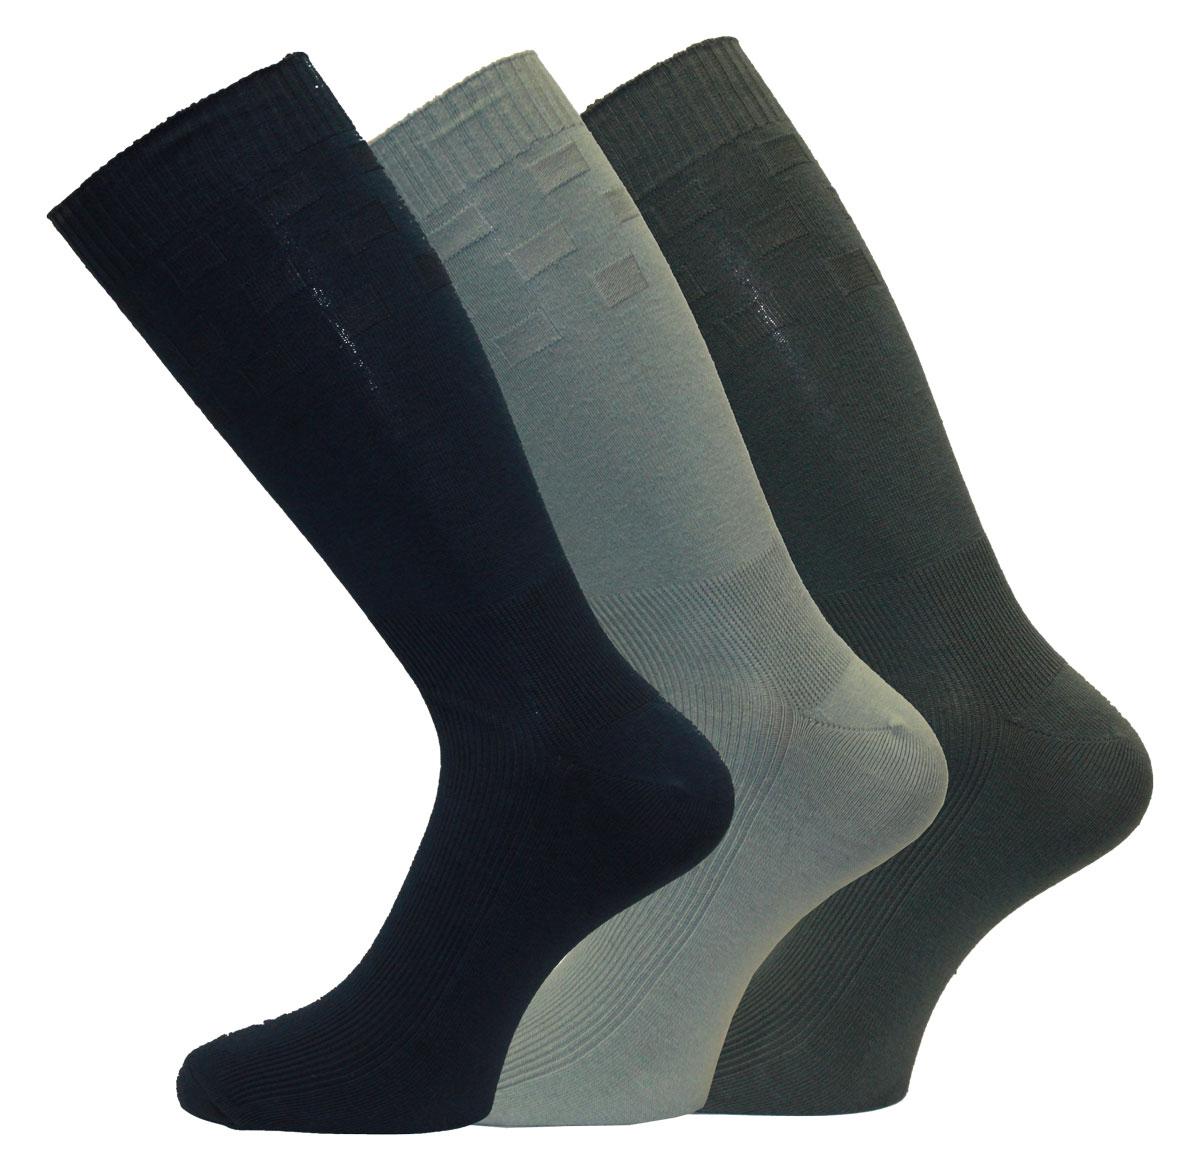 Roomy Compression Socks - Ryan Pharmacy